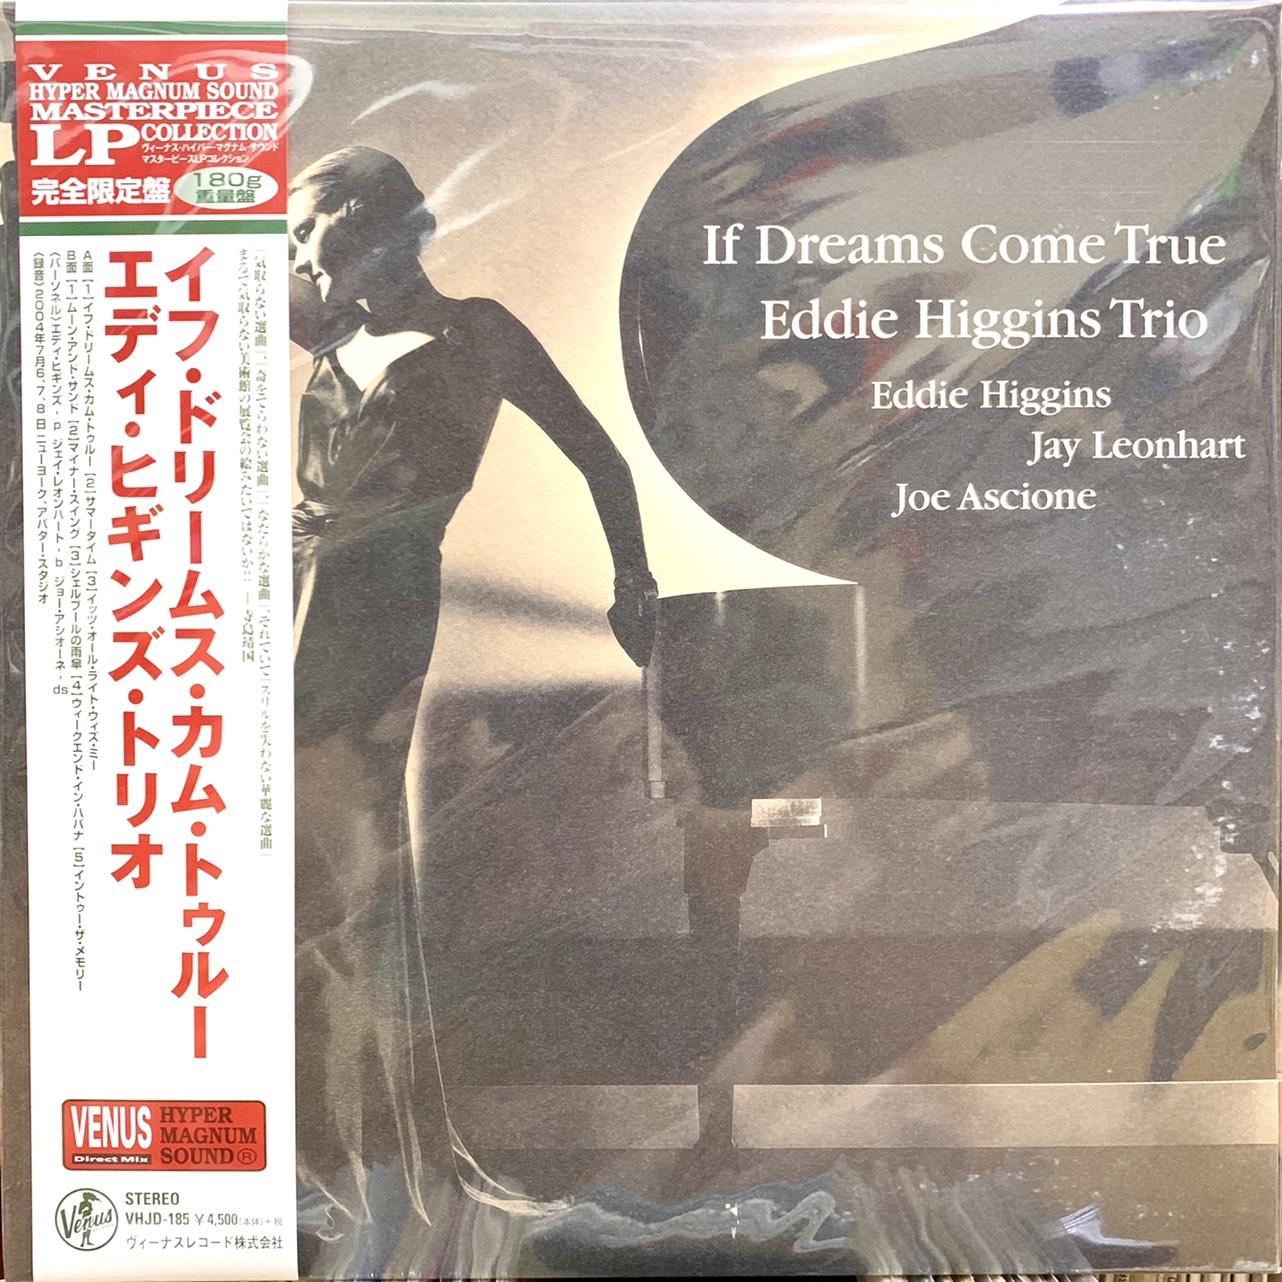 dia-than-vinyl-if-dreams-come-true-eddie-higgins-trio